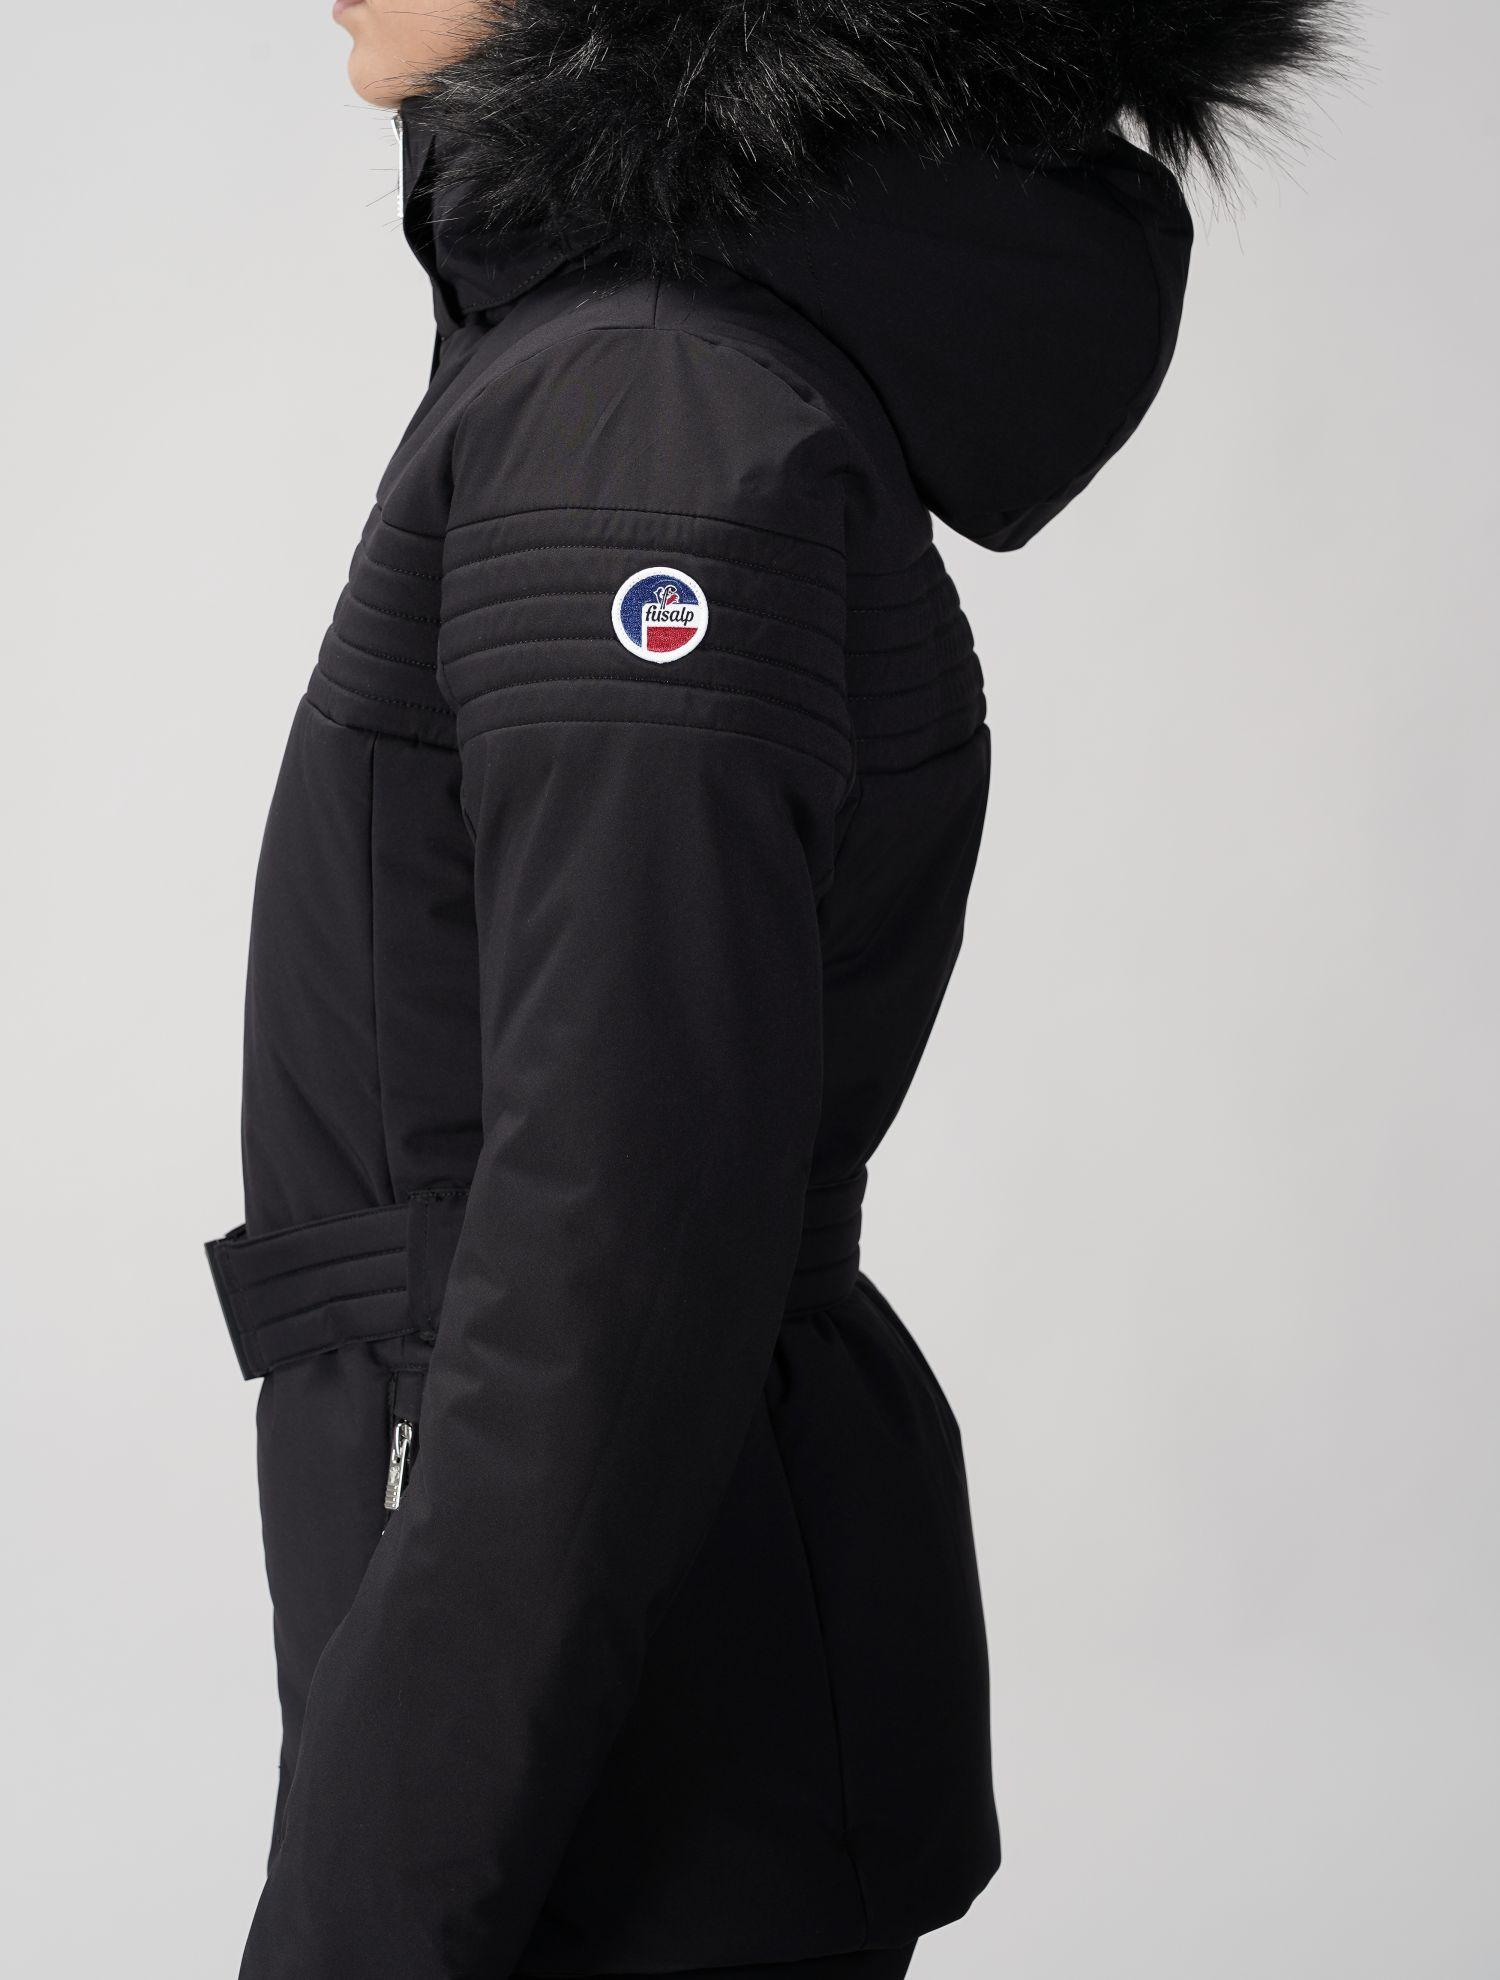 najy ff ski jacket fusalp